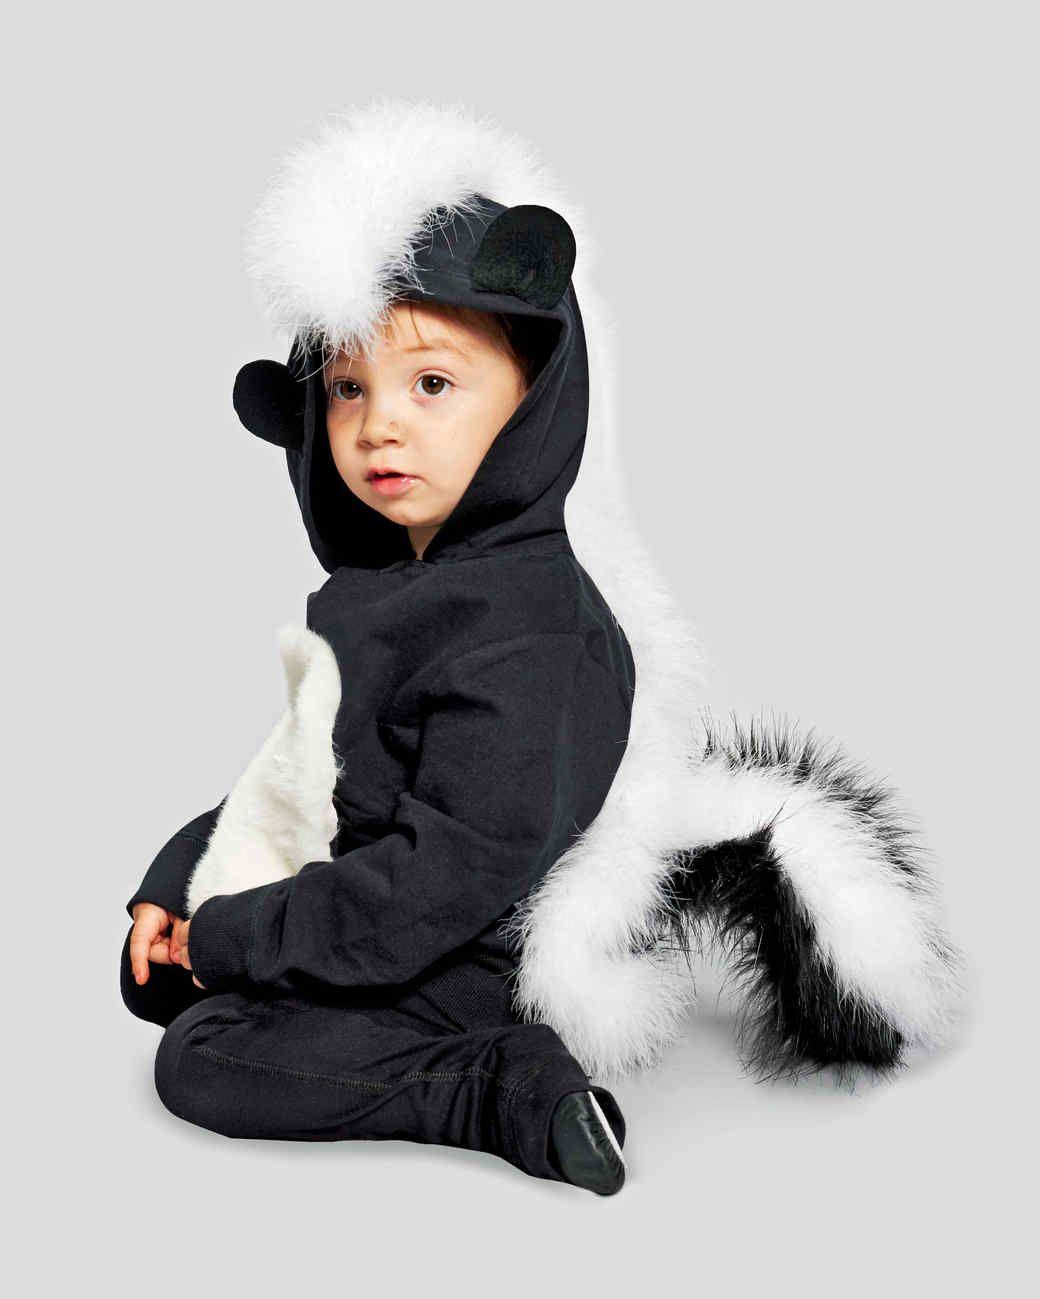 skunk costume | baby skunk costume, skunk costume and costumes